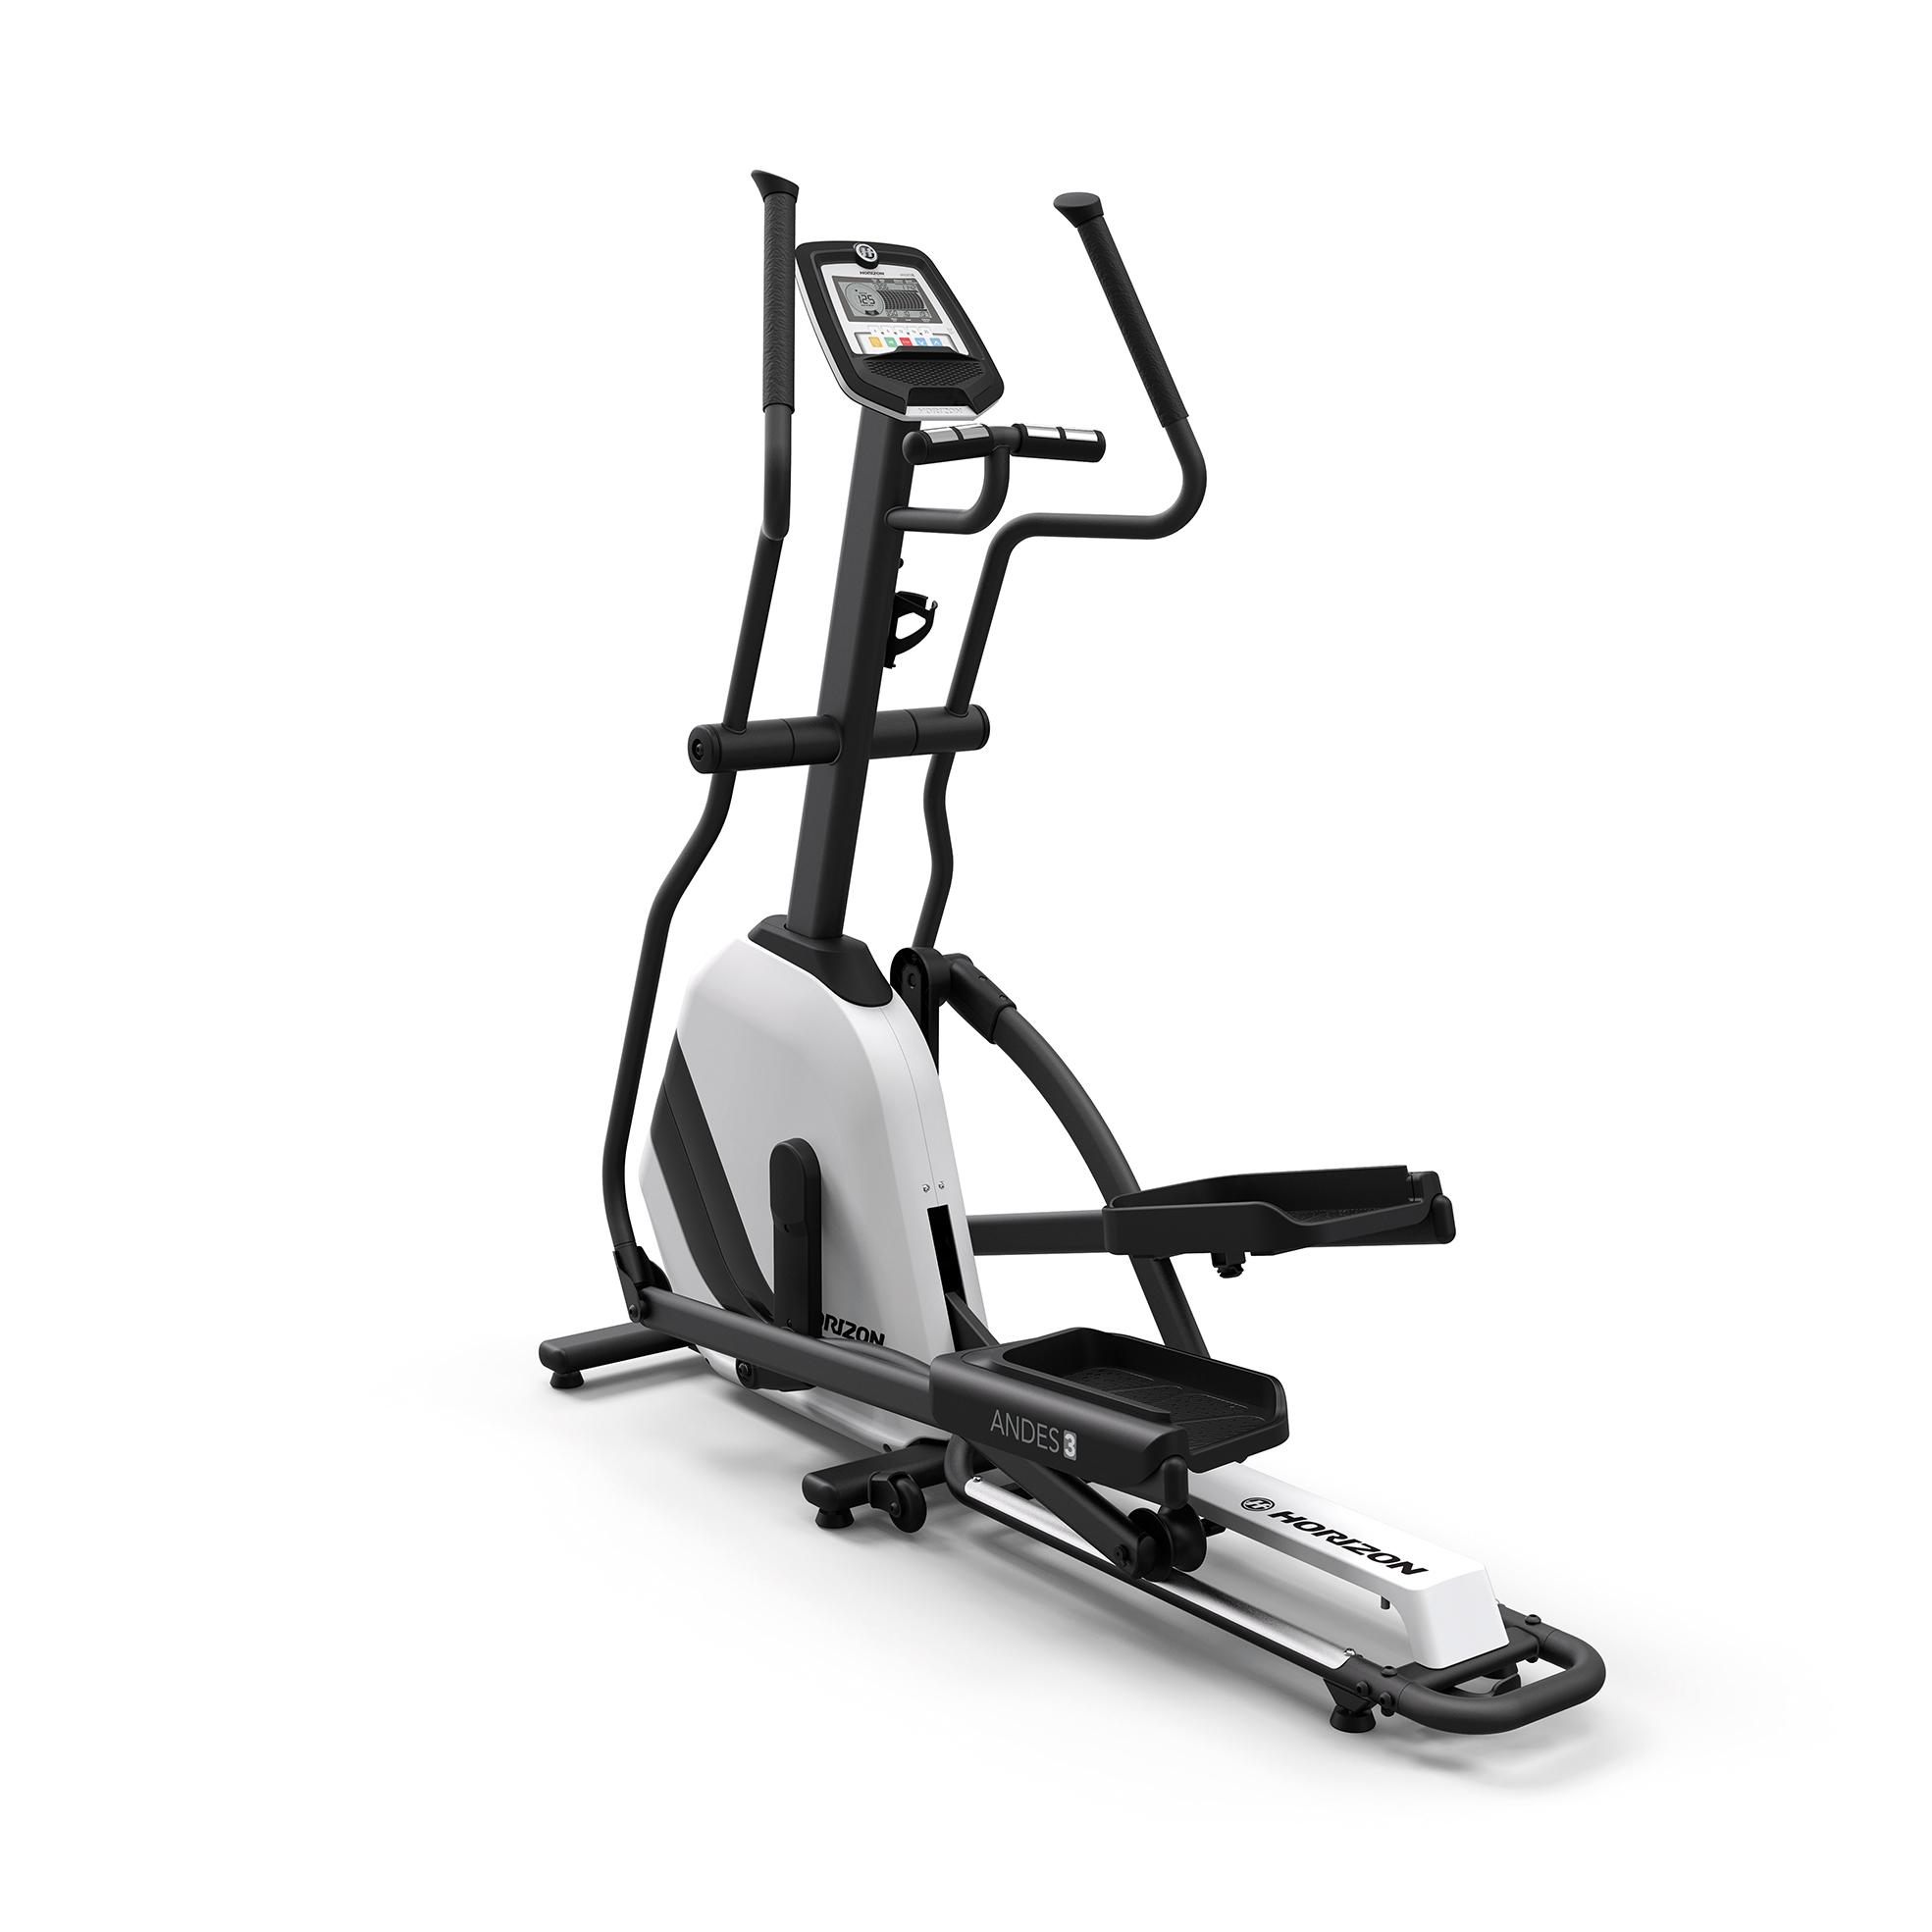 v lo elliptique andes 3 machines de fitness sur. Black Bedroom Furniture Sets. Home Design Ideas